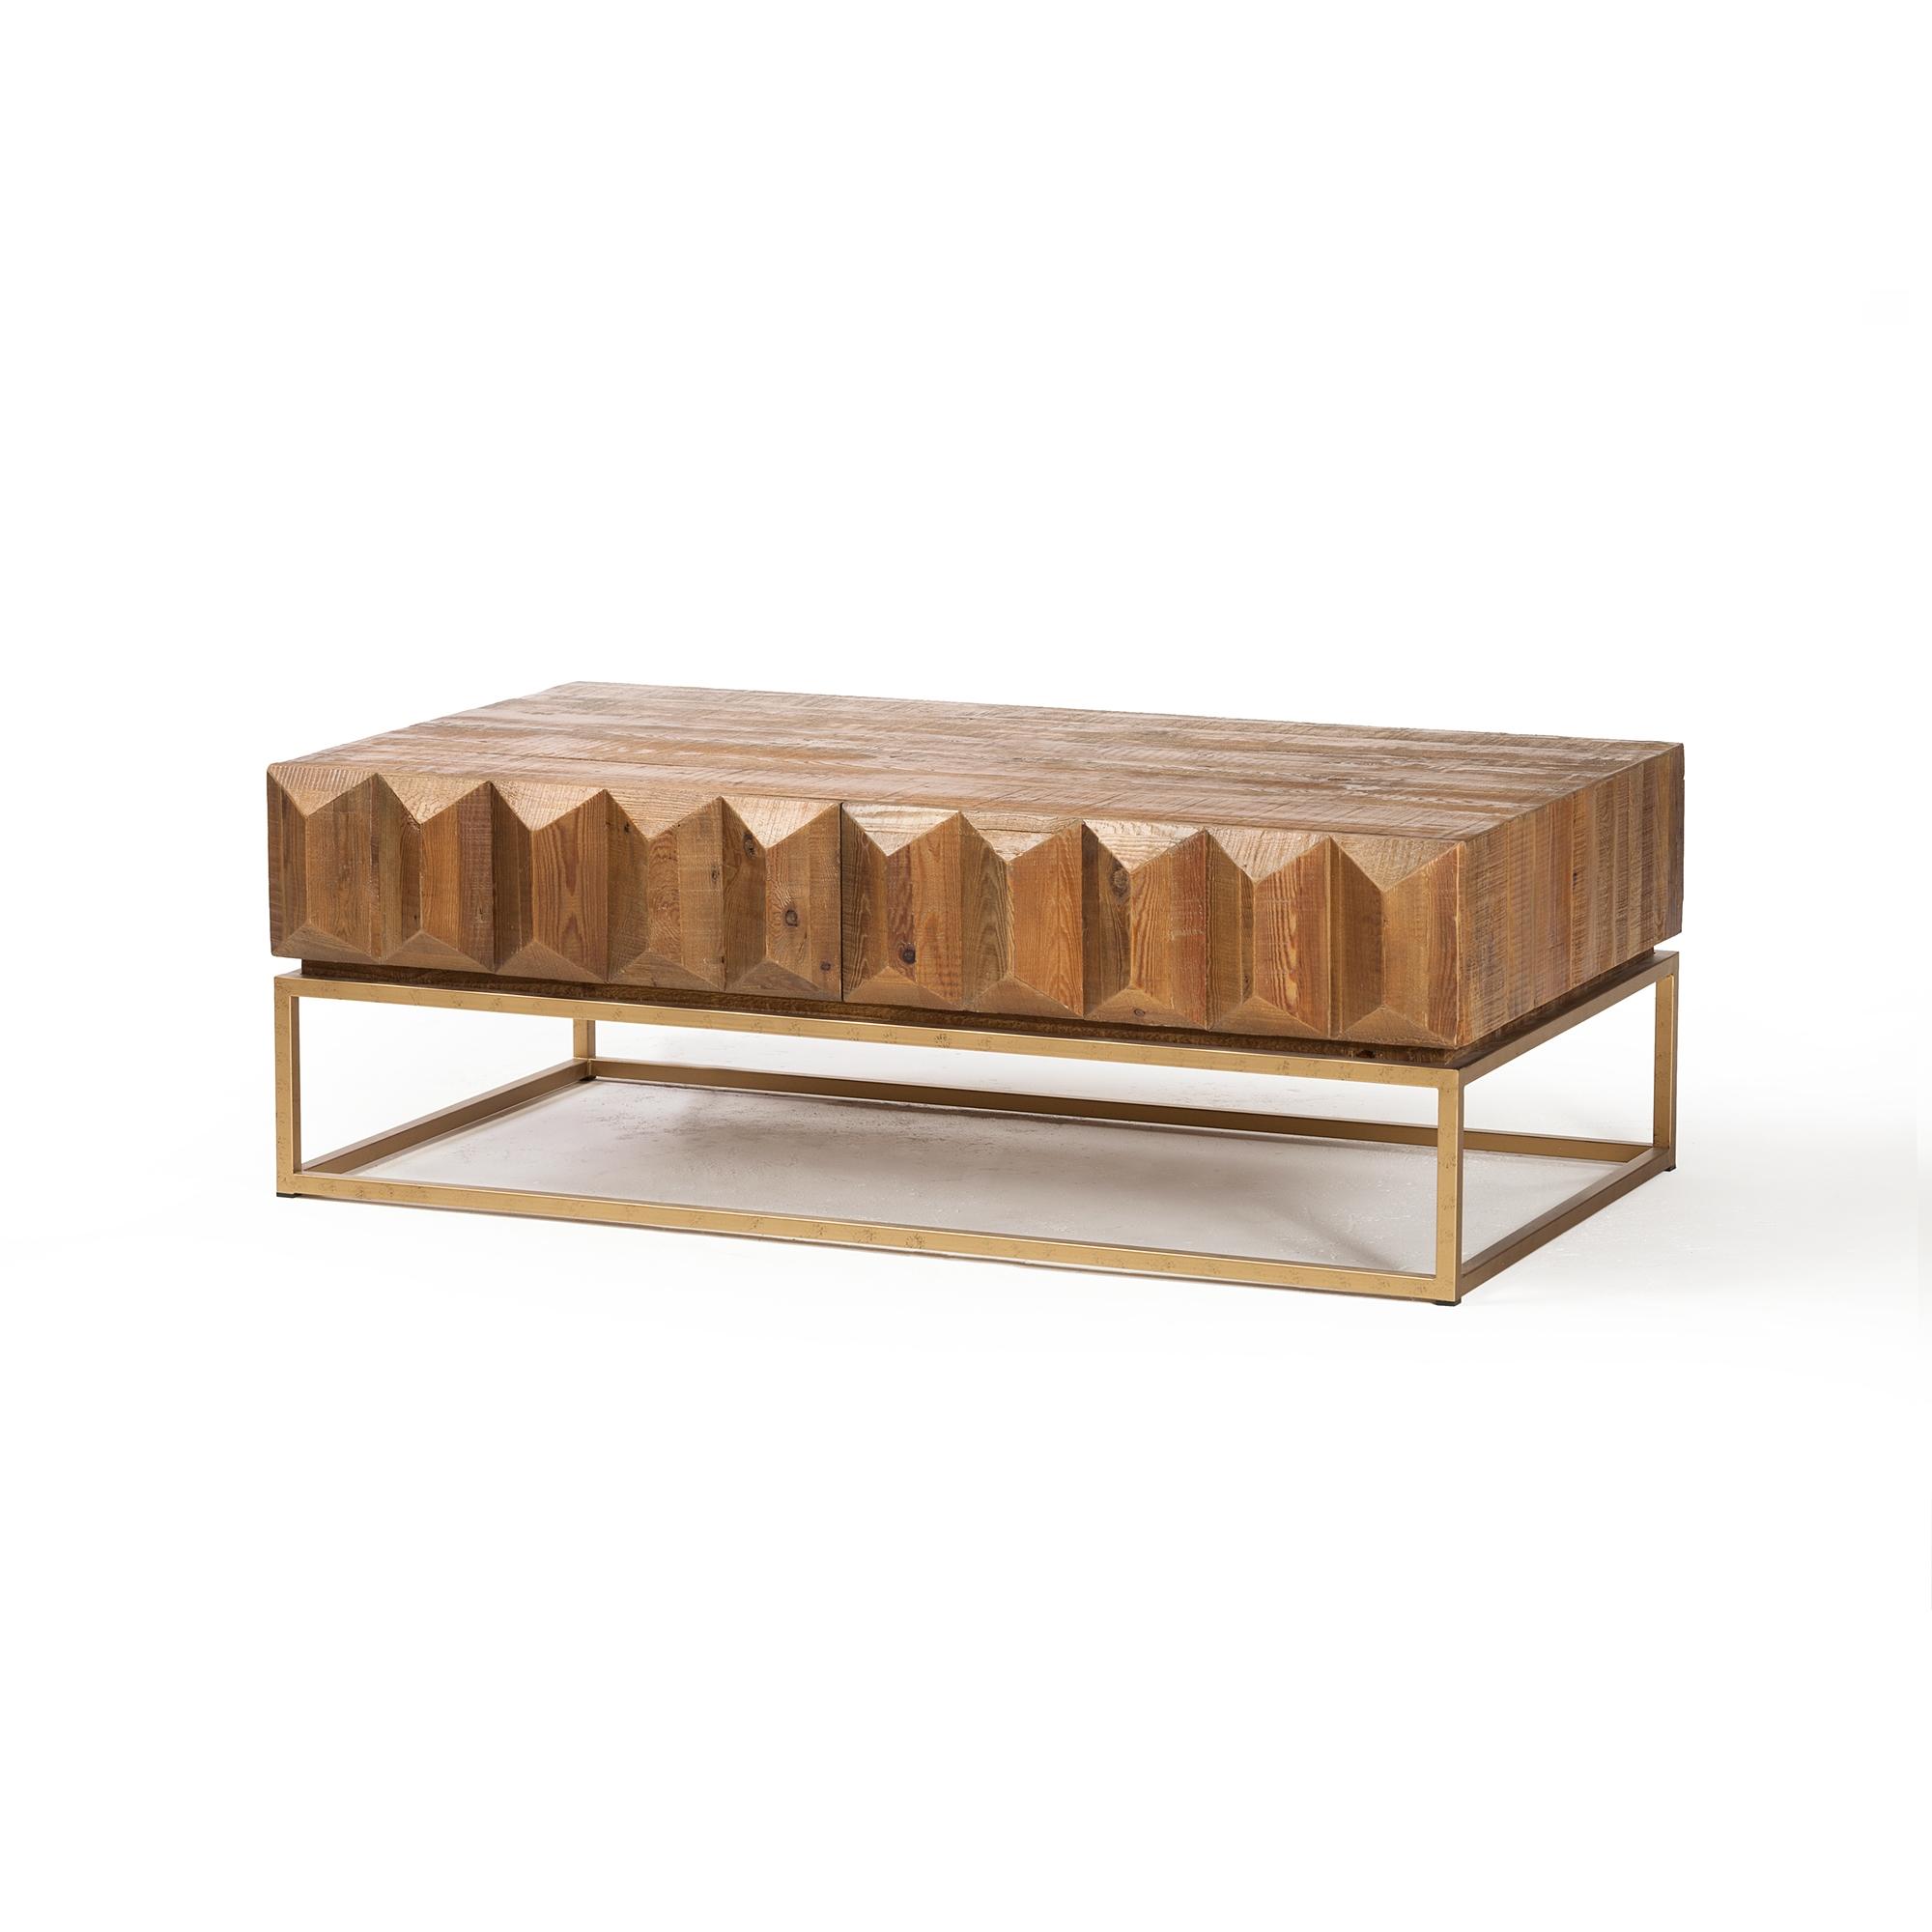 Horus Reclaimed Pine Coffee Table